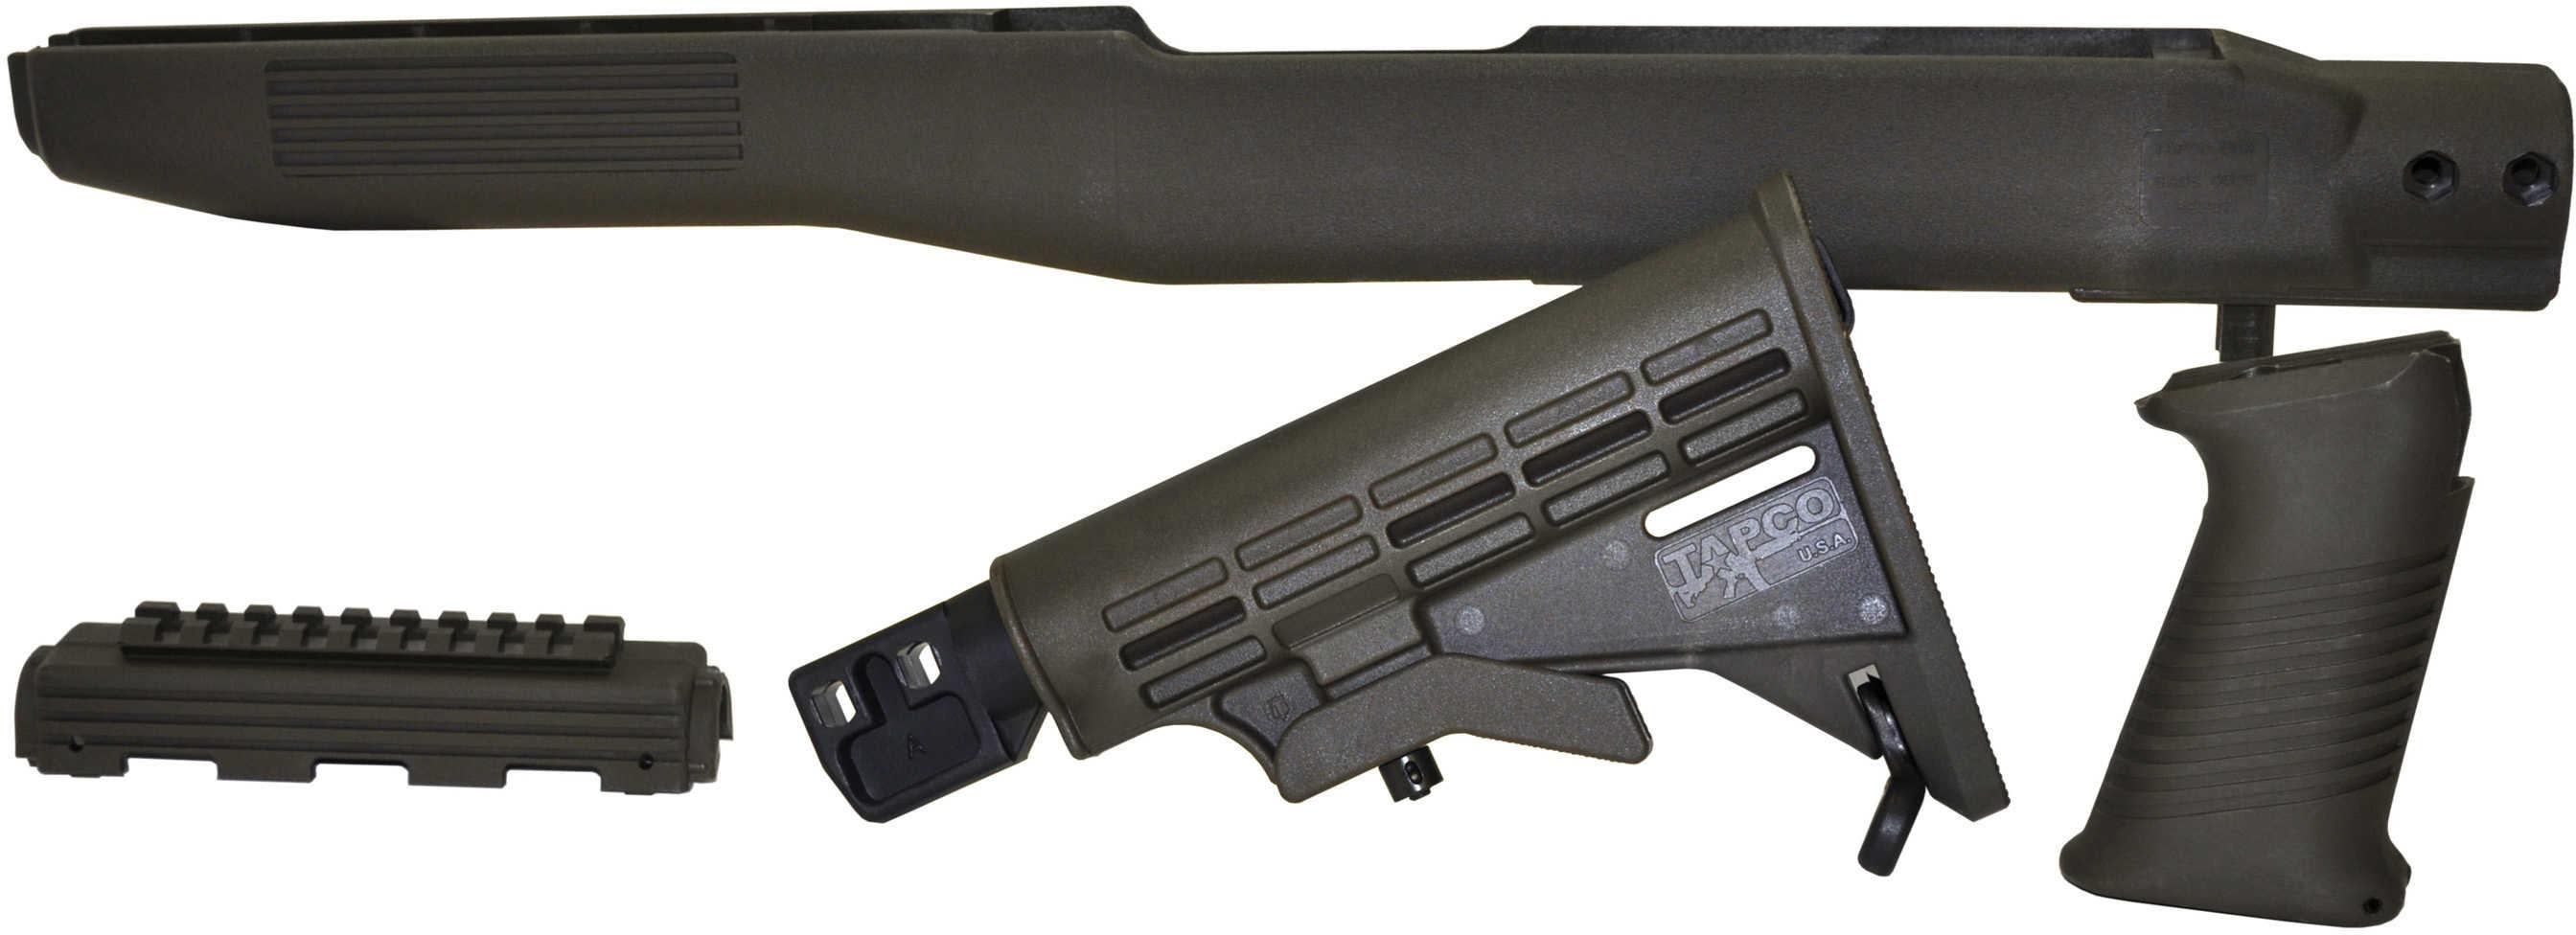 Tapco Intrafuse SKS System Blade Bayonet Olive Drab STK66167-OD